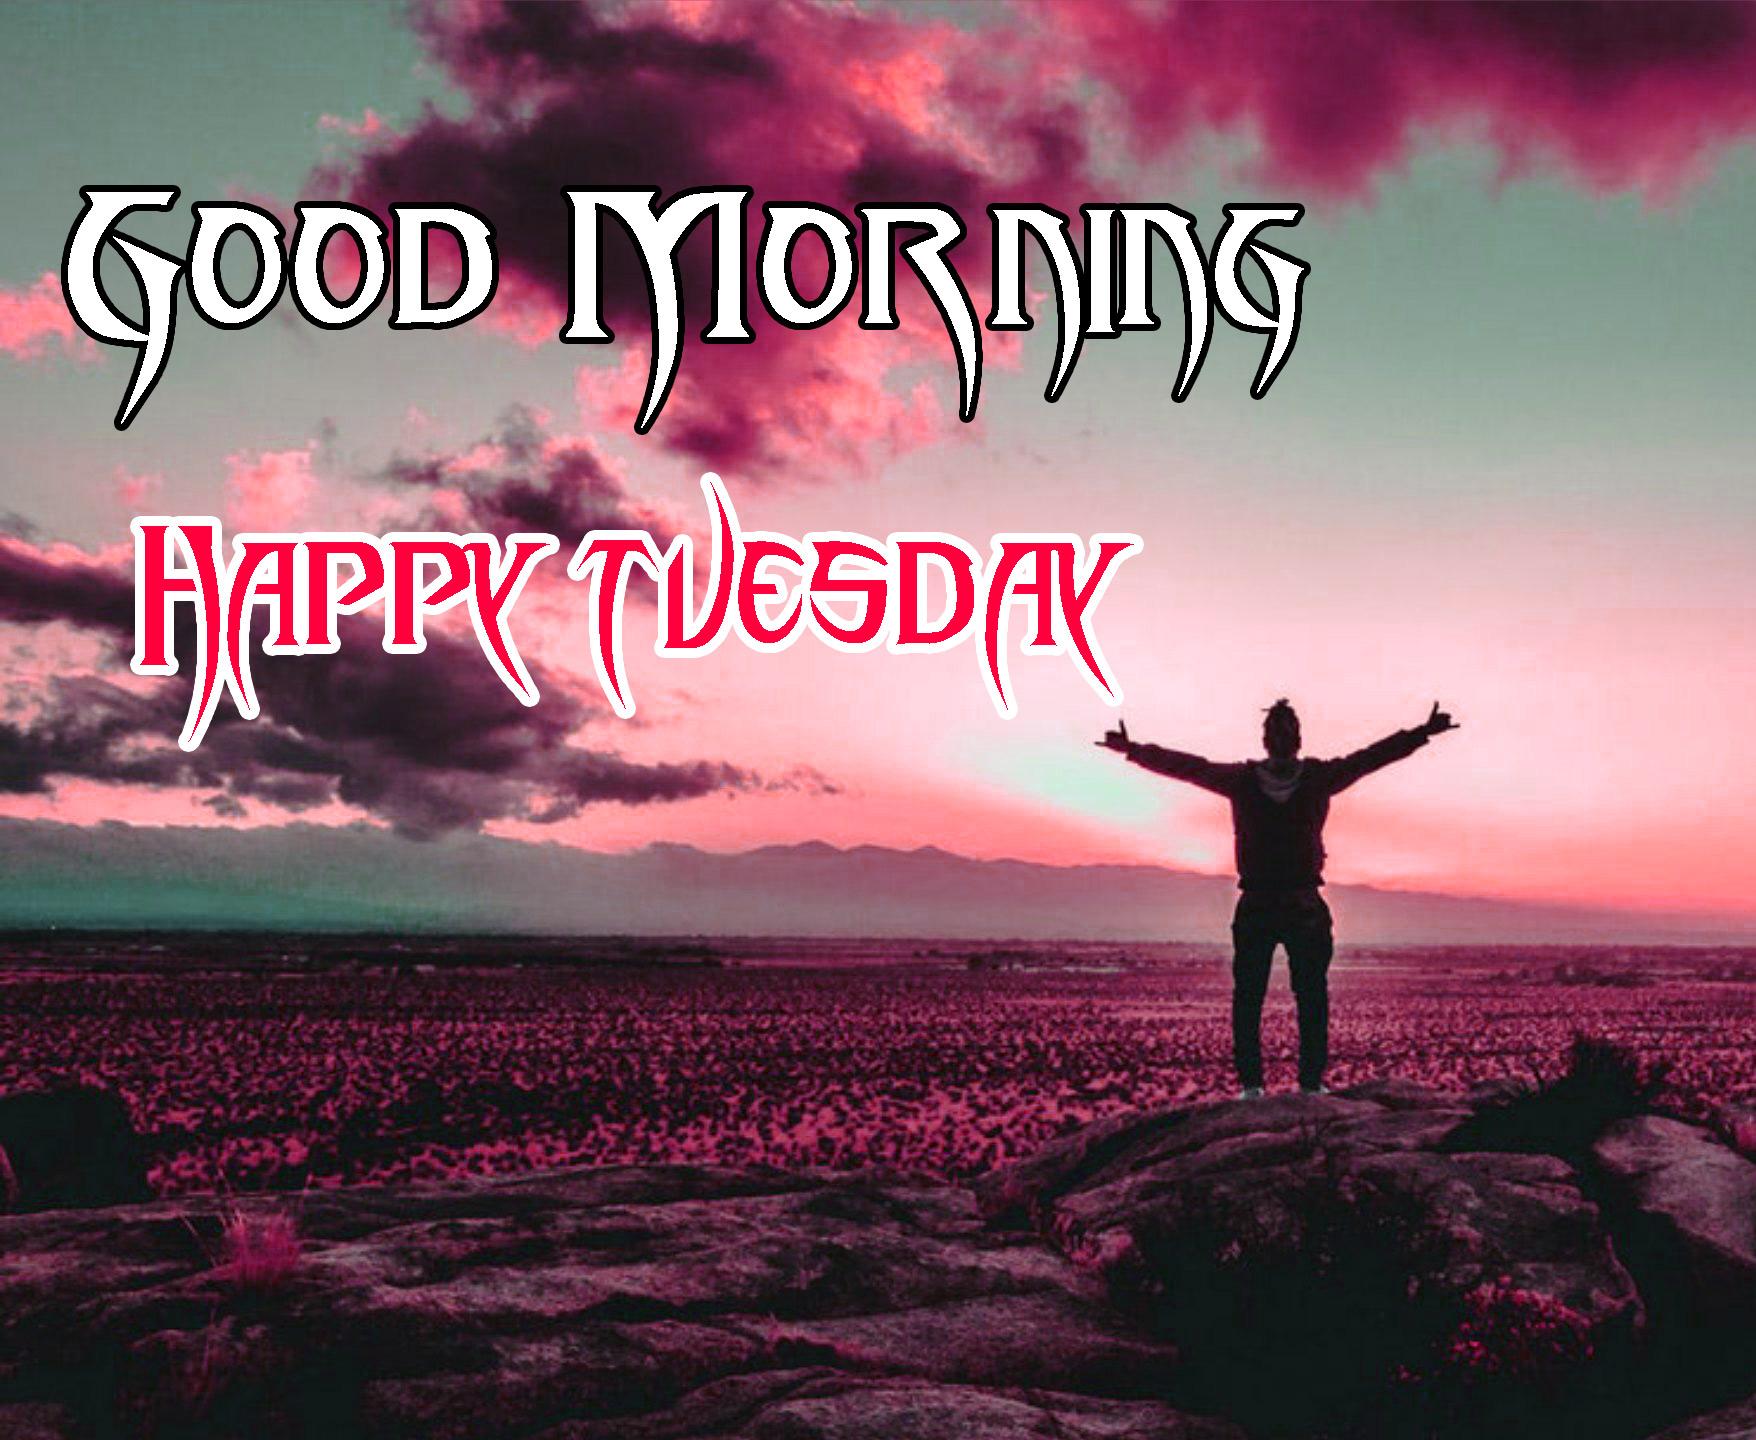 Joyful good morning Photo for Facebook